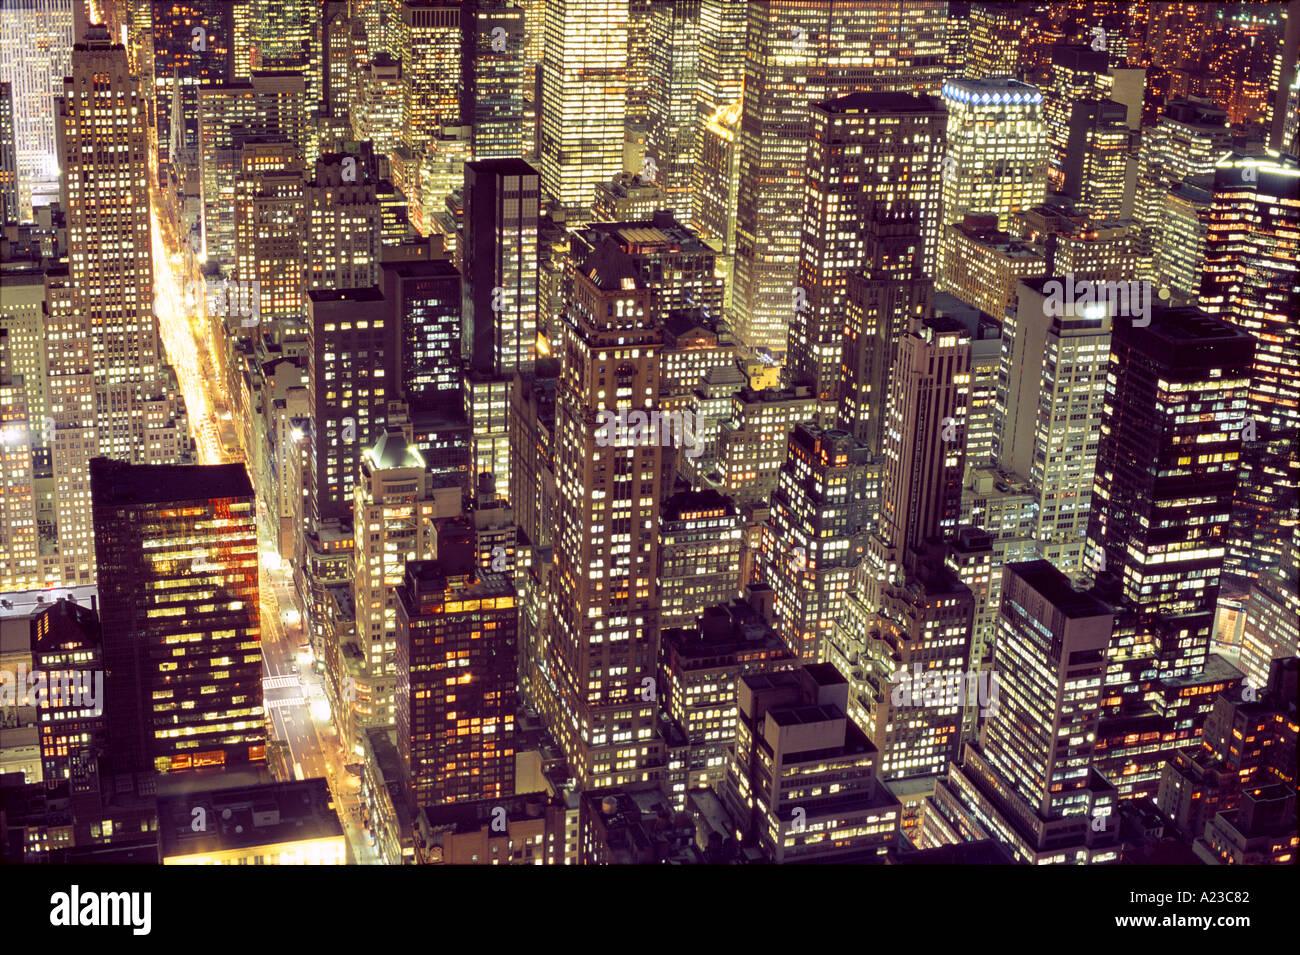 USA New York New York City aerial view of Manhattan at night - Stock Image